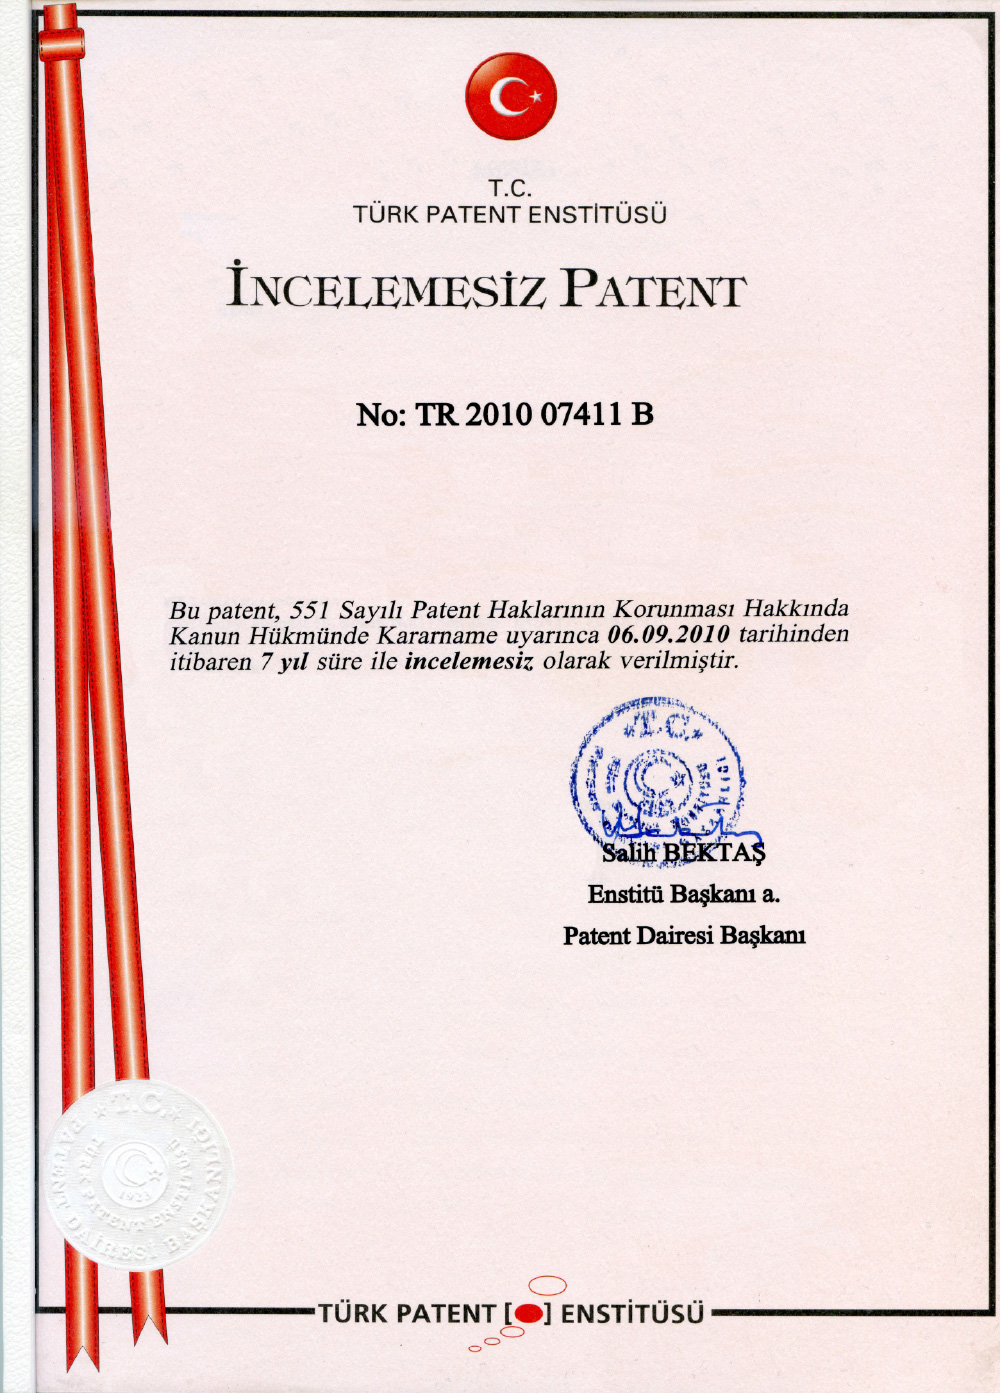 Patentdokument